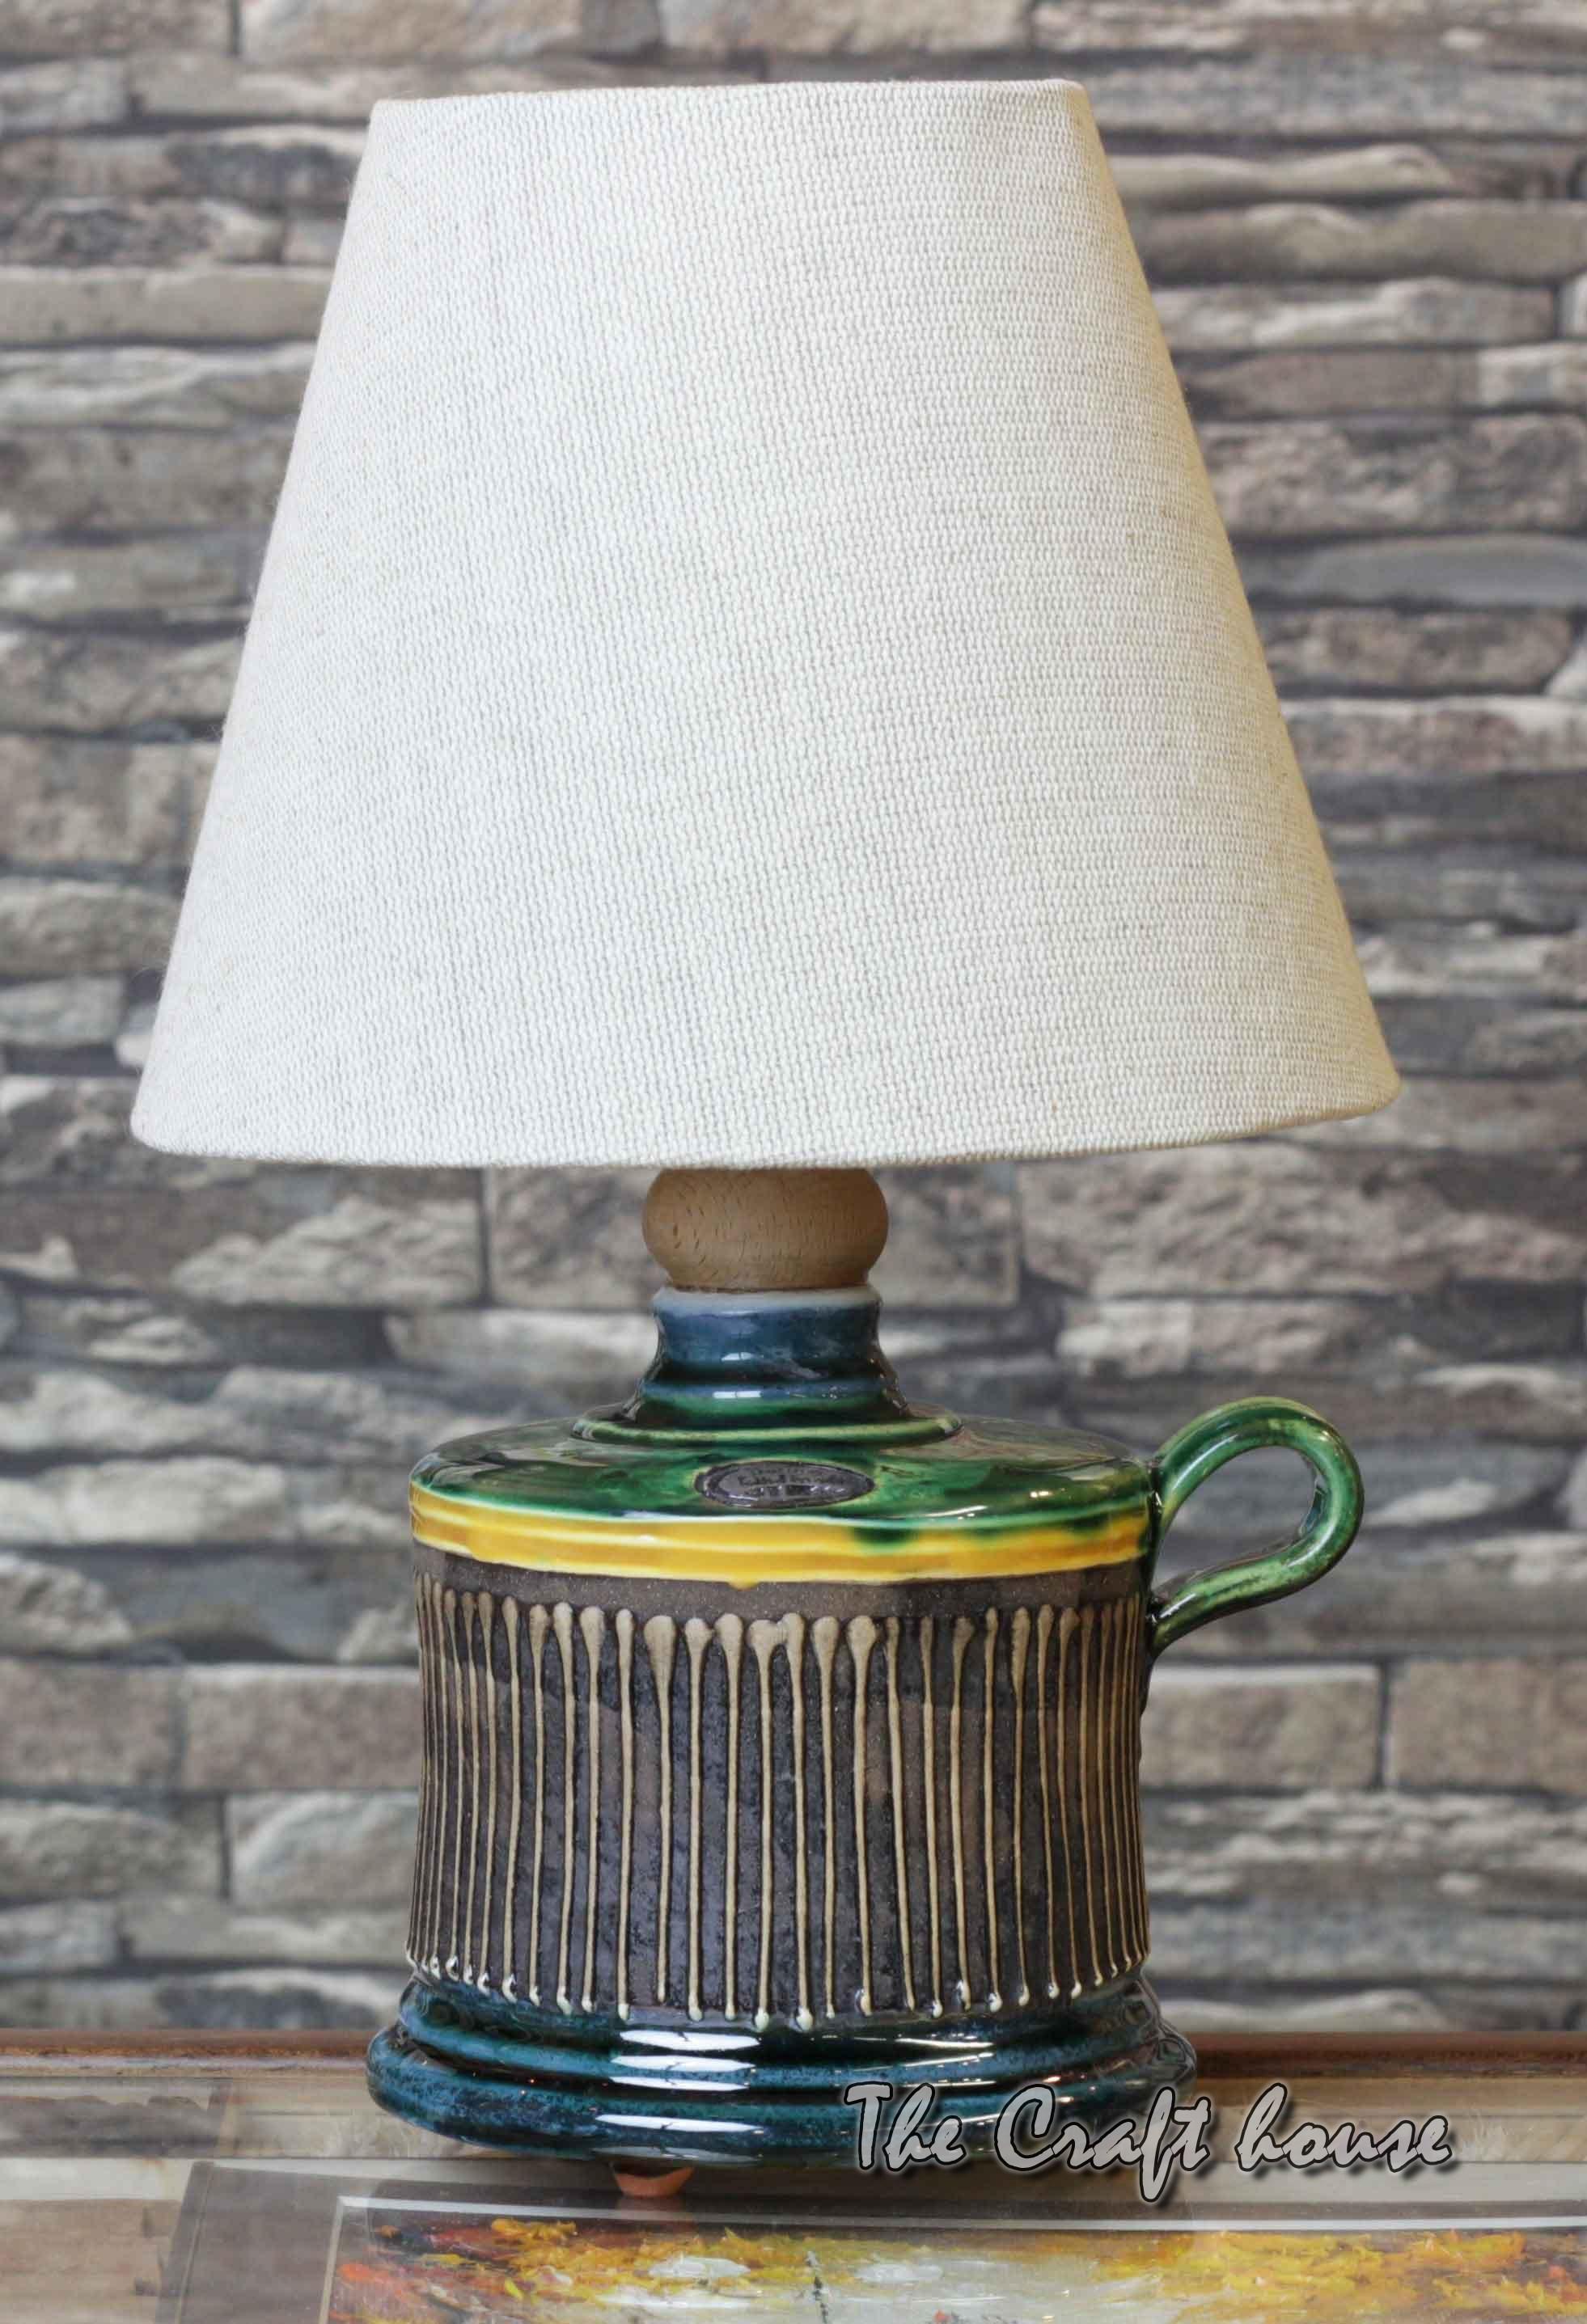 Art ceramic lamp